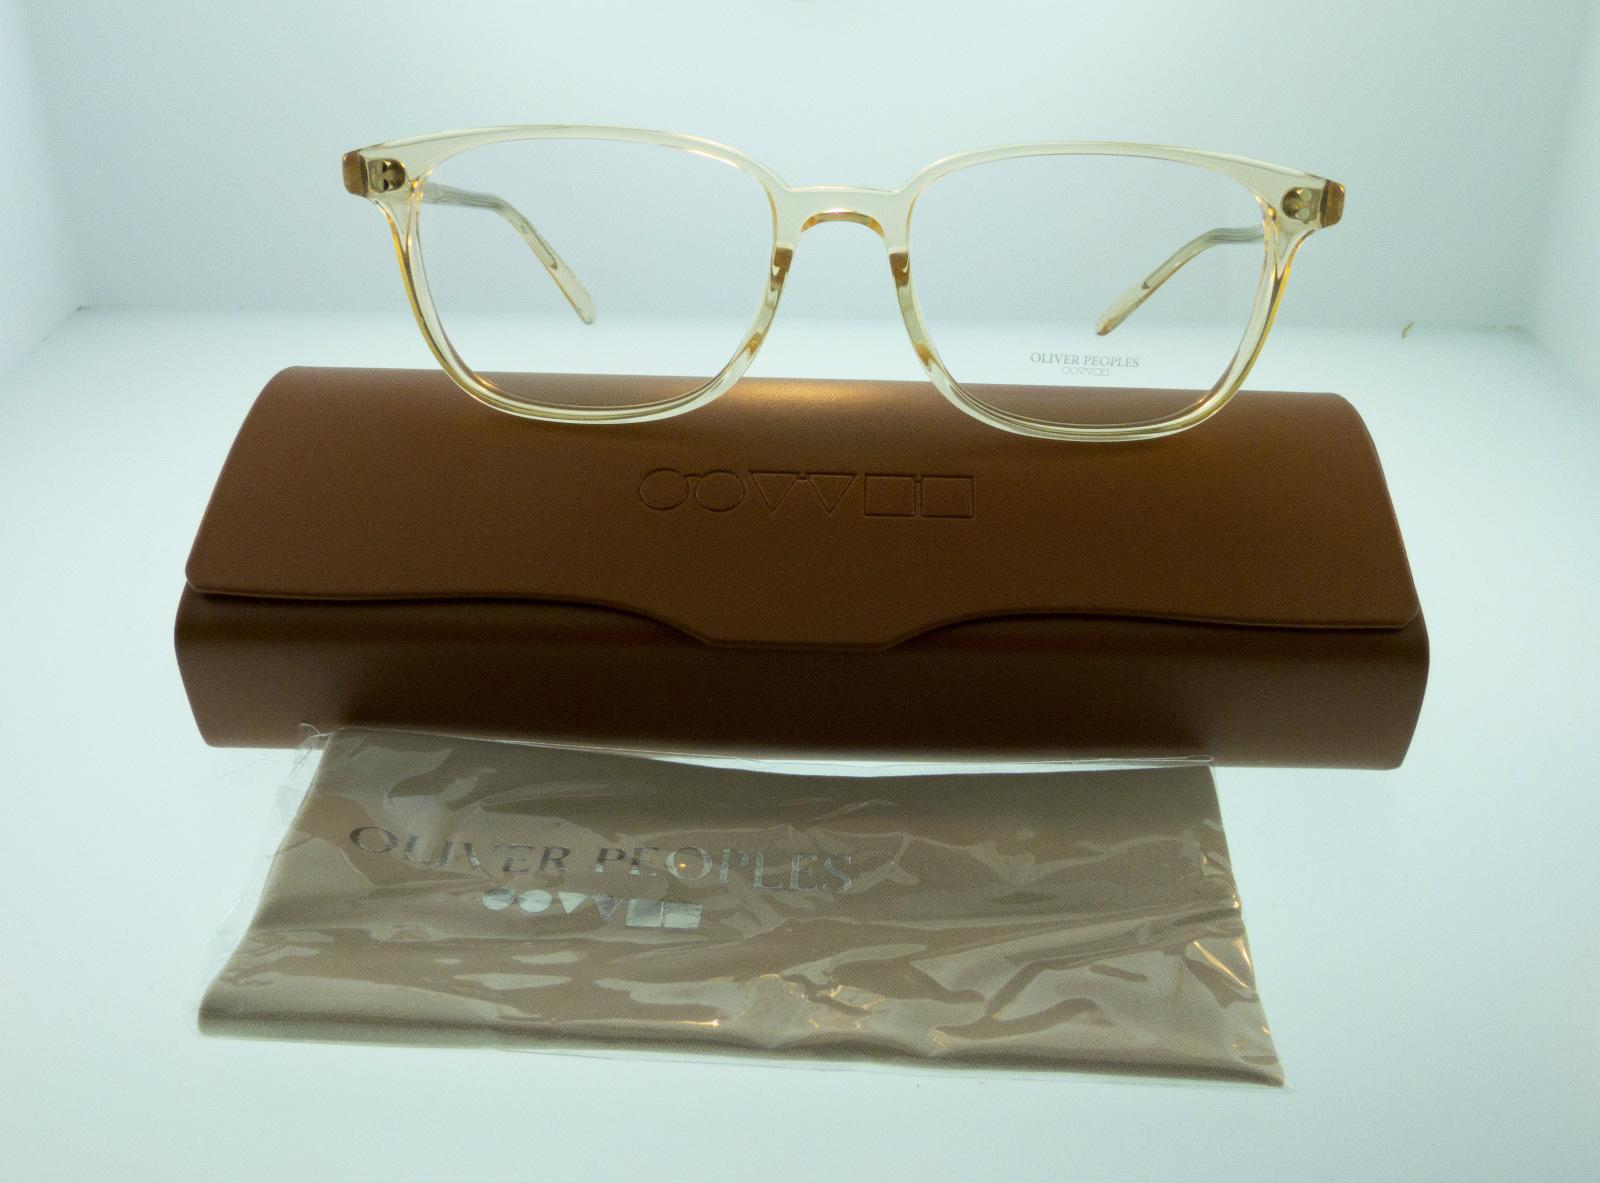 4c9e6c6dbfac Oliver Peoples Maslon RX Eyeglasses Translucent Buff 5279 1094 53mm ...